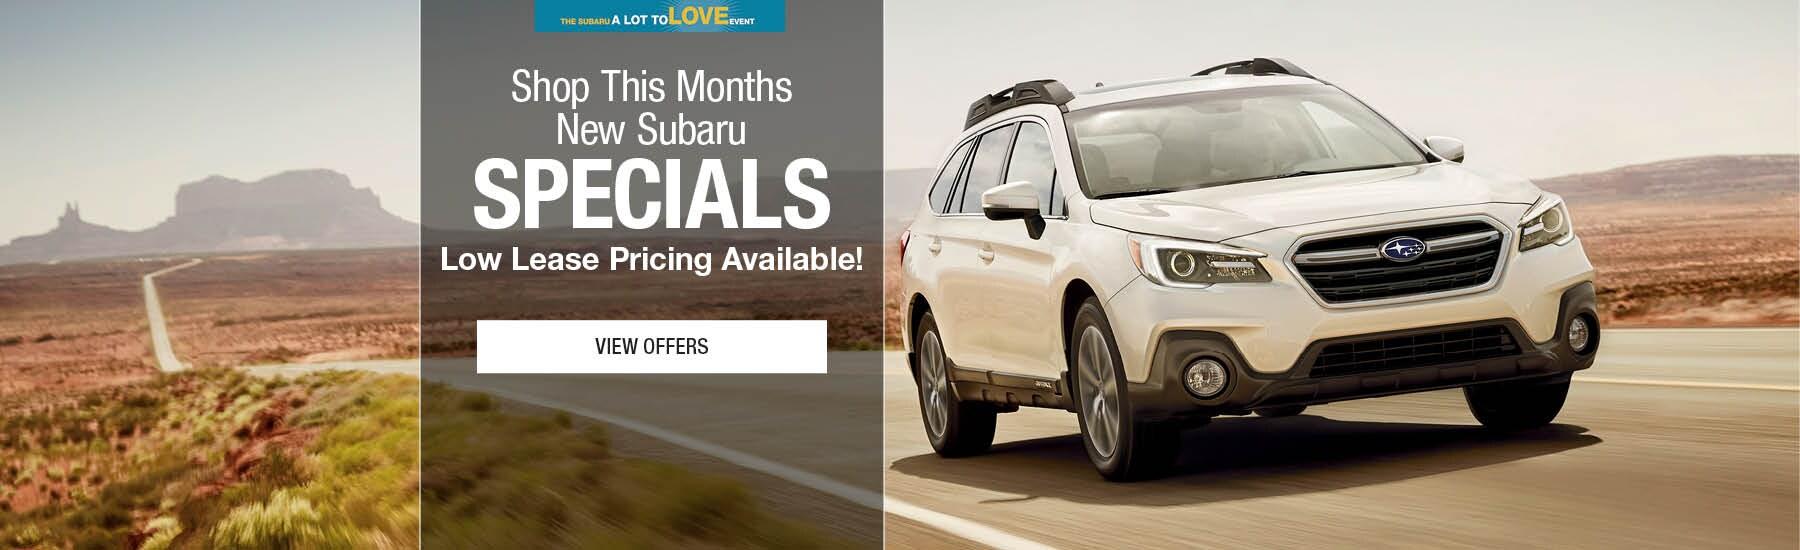 McCurley Integrity Subaru | New Subaru & Used Car Dealer in Pasco